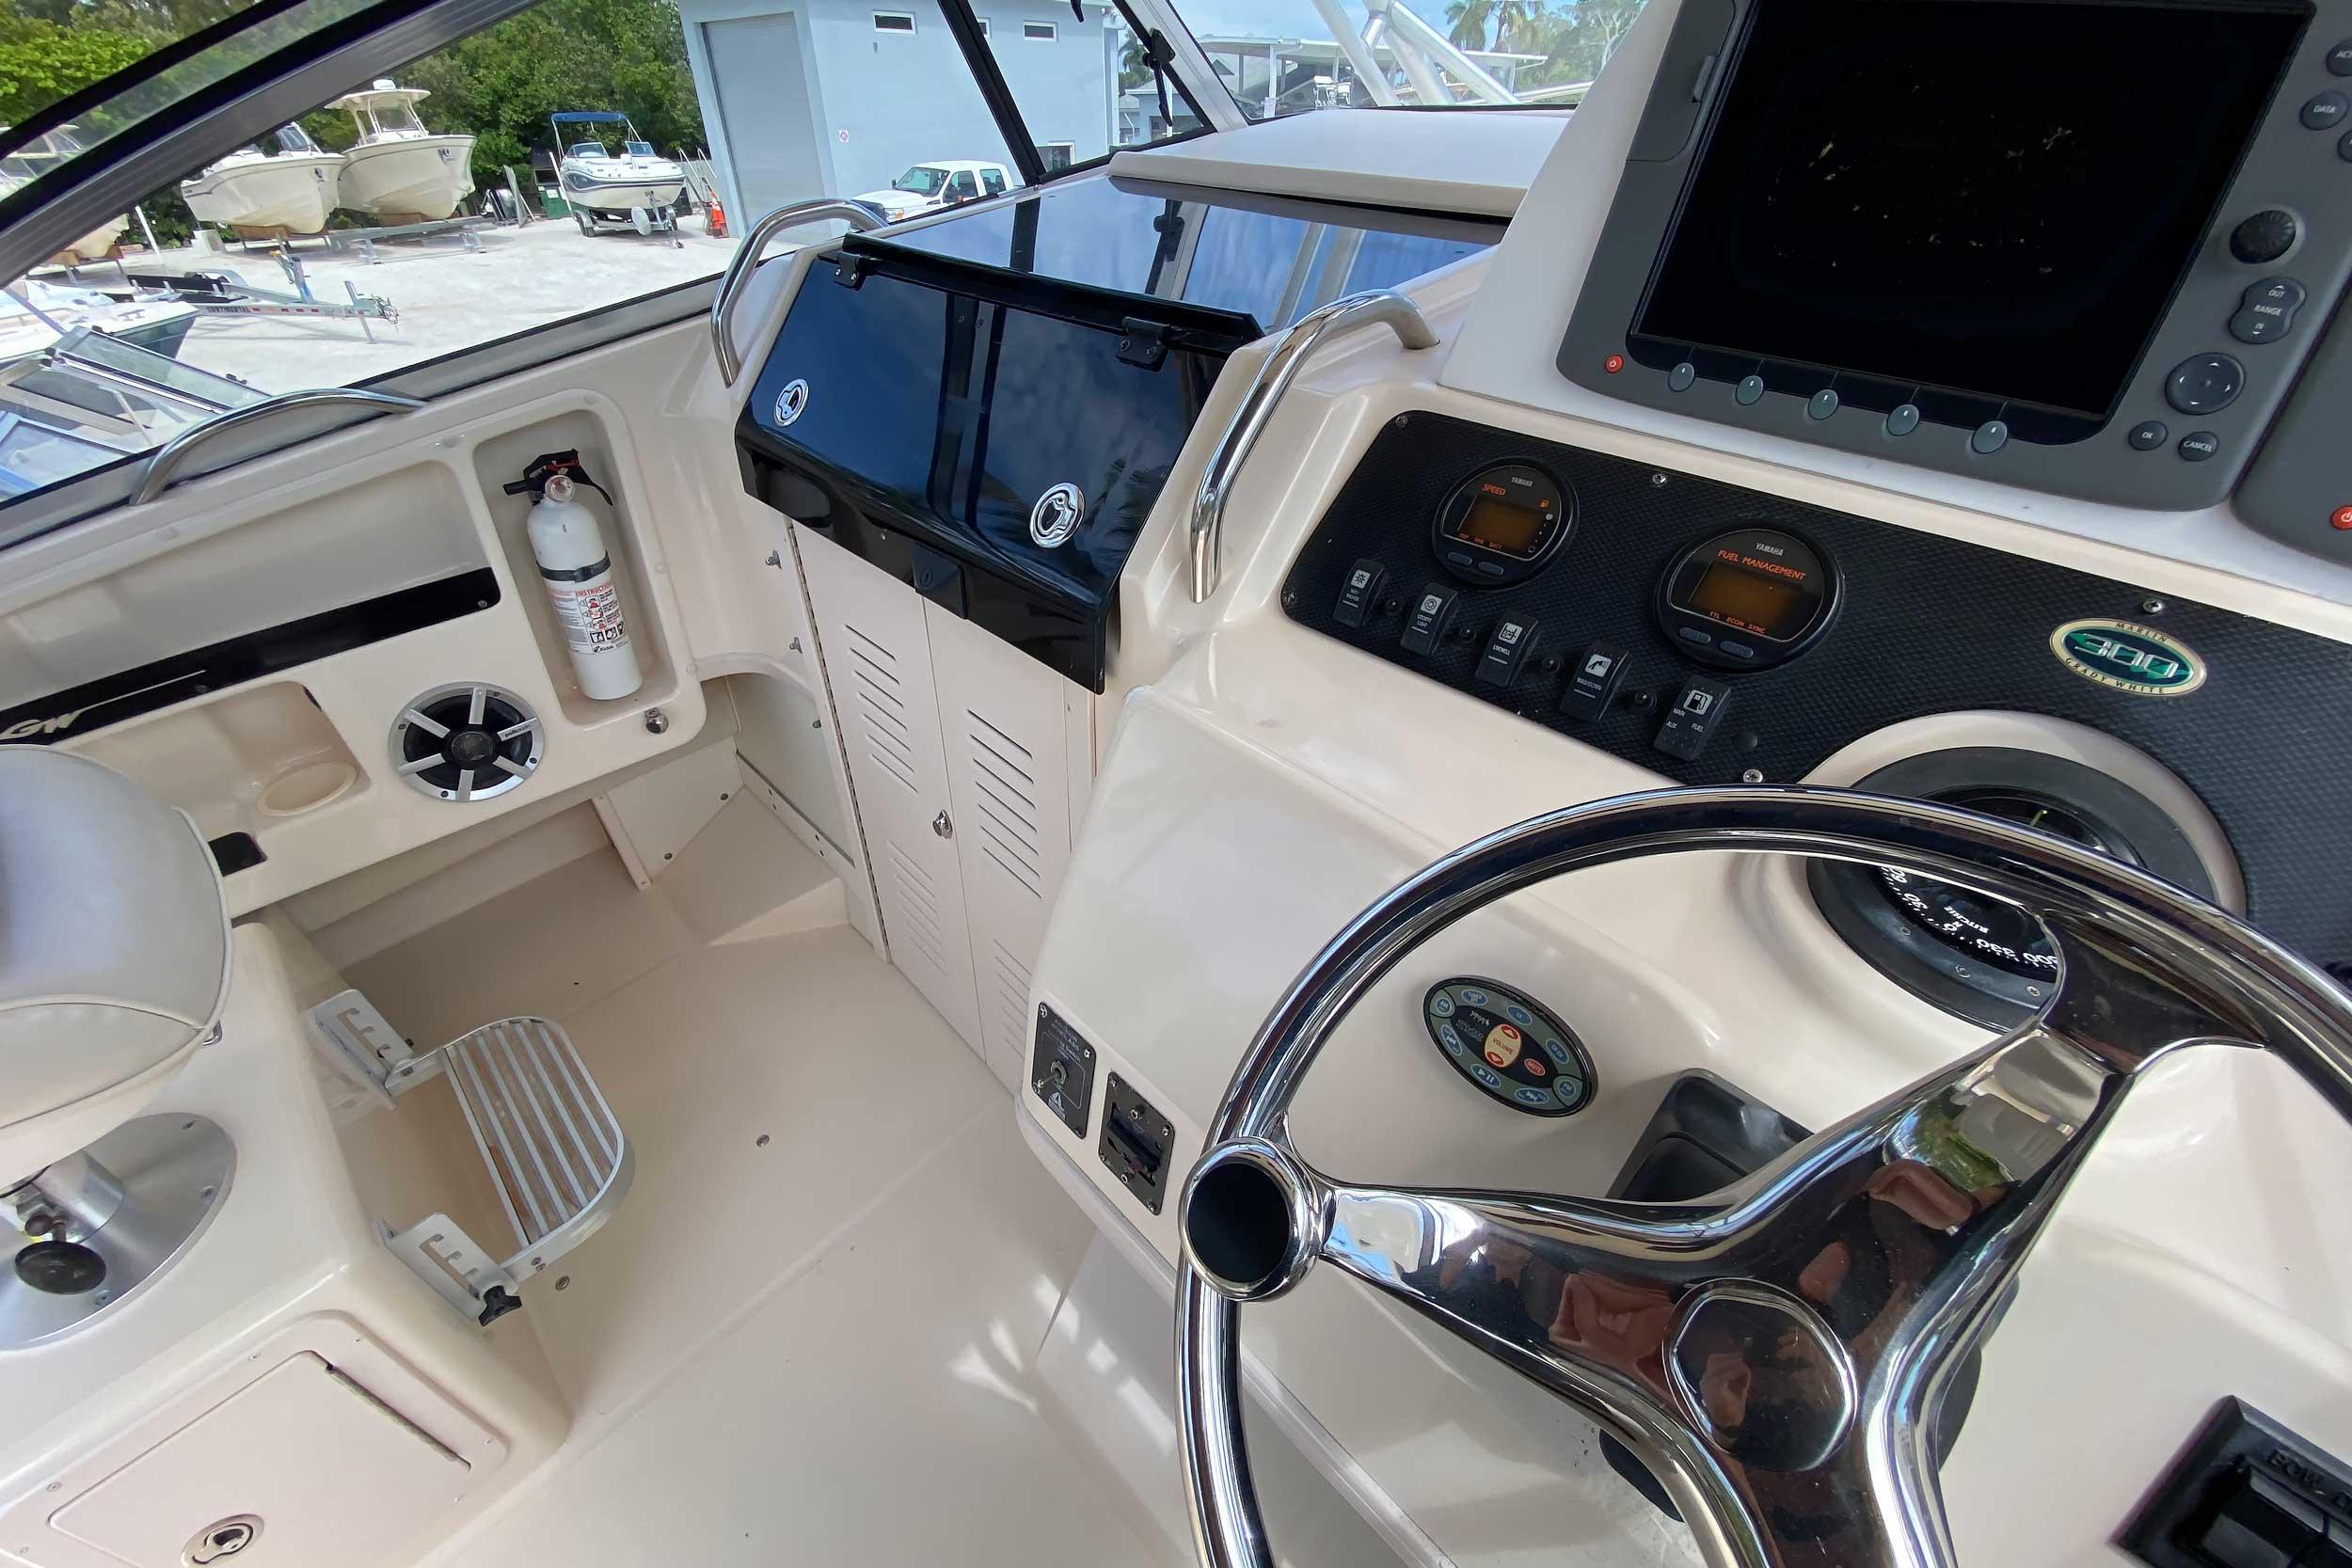 2005 Grady-White 300 Marlin